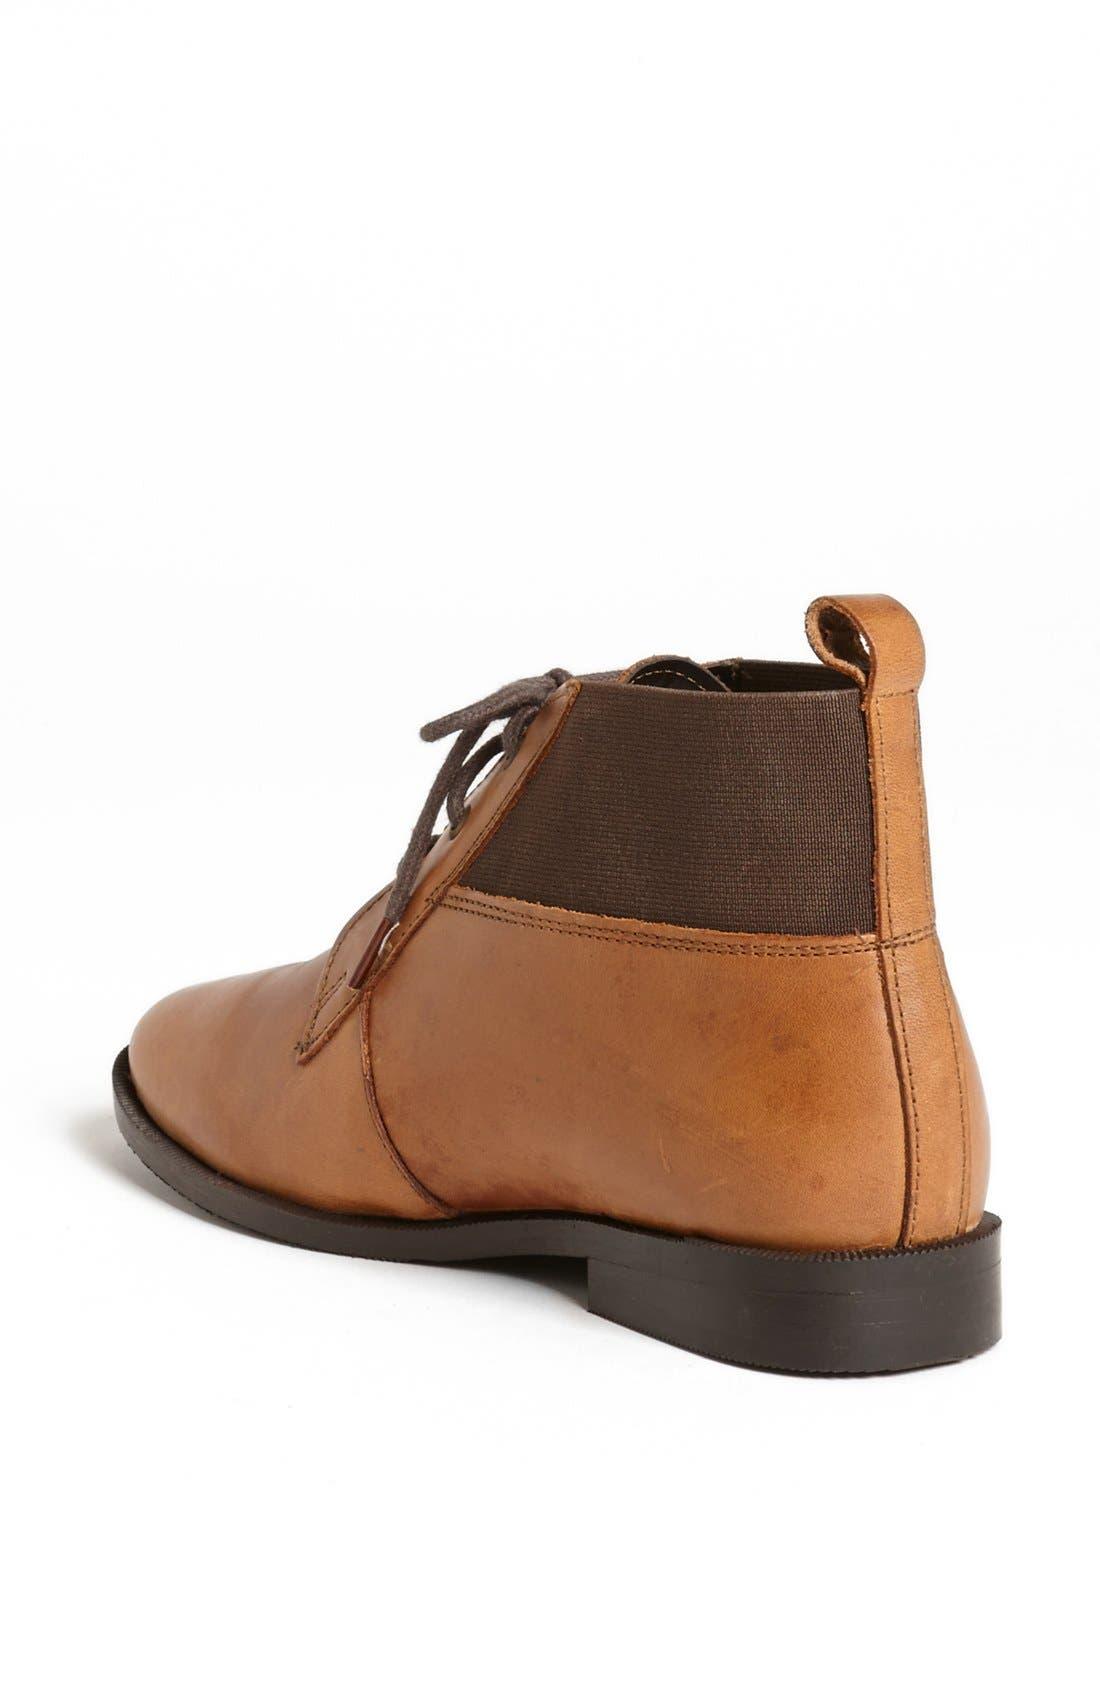 Alternate Image 2  - Topshop 'Model' Ankle Boot